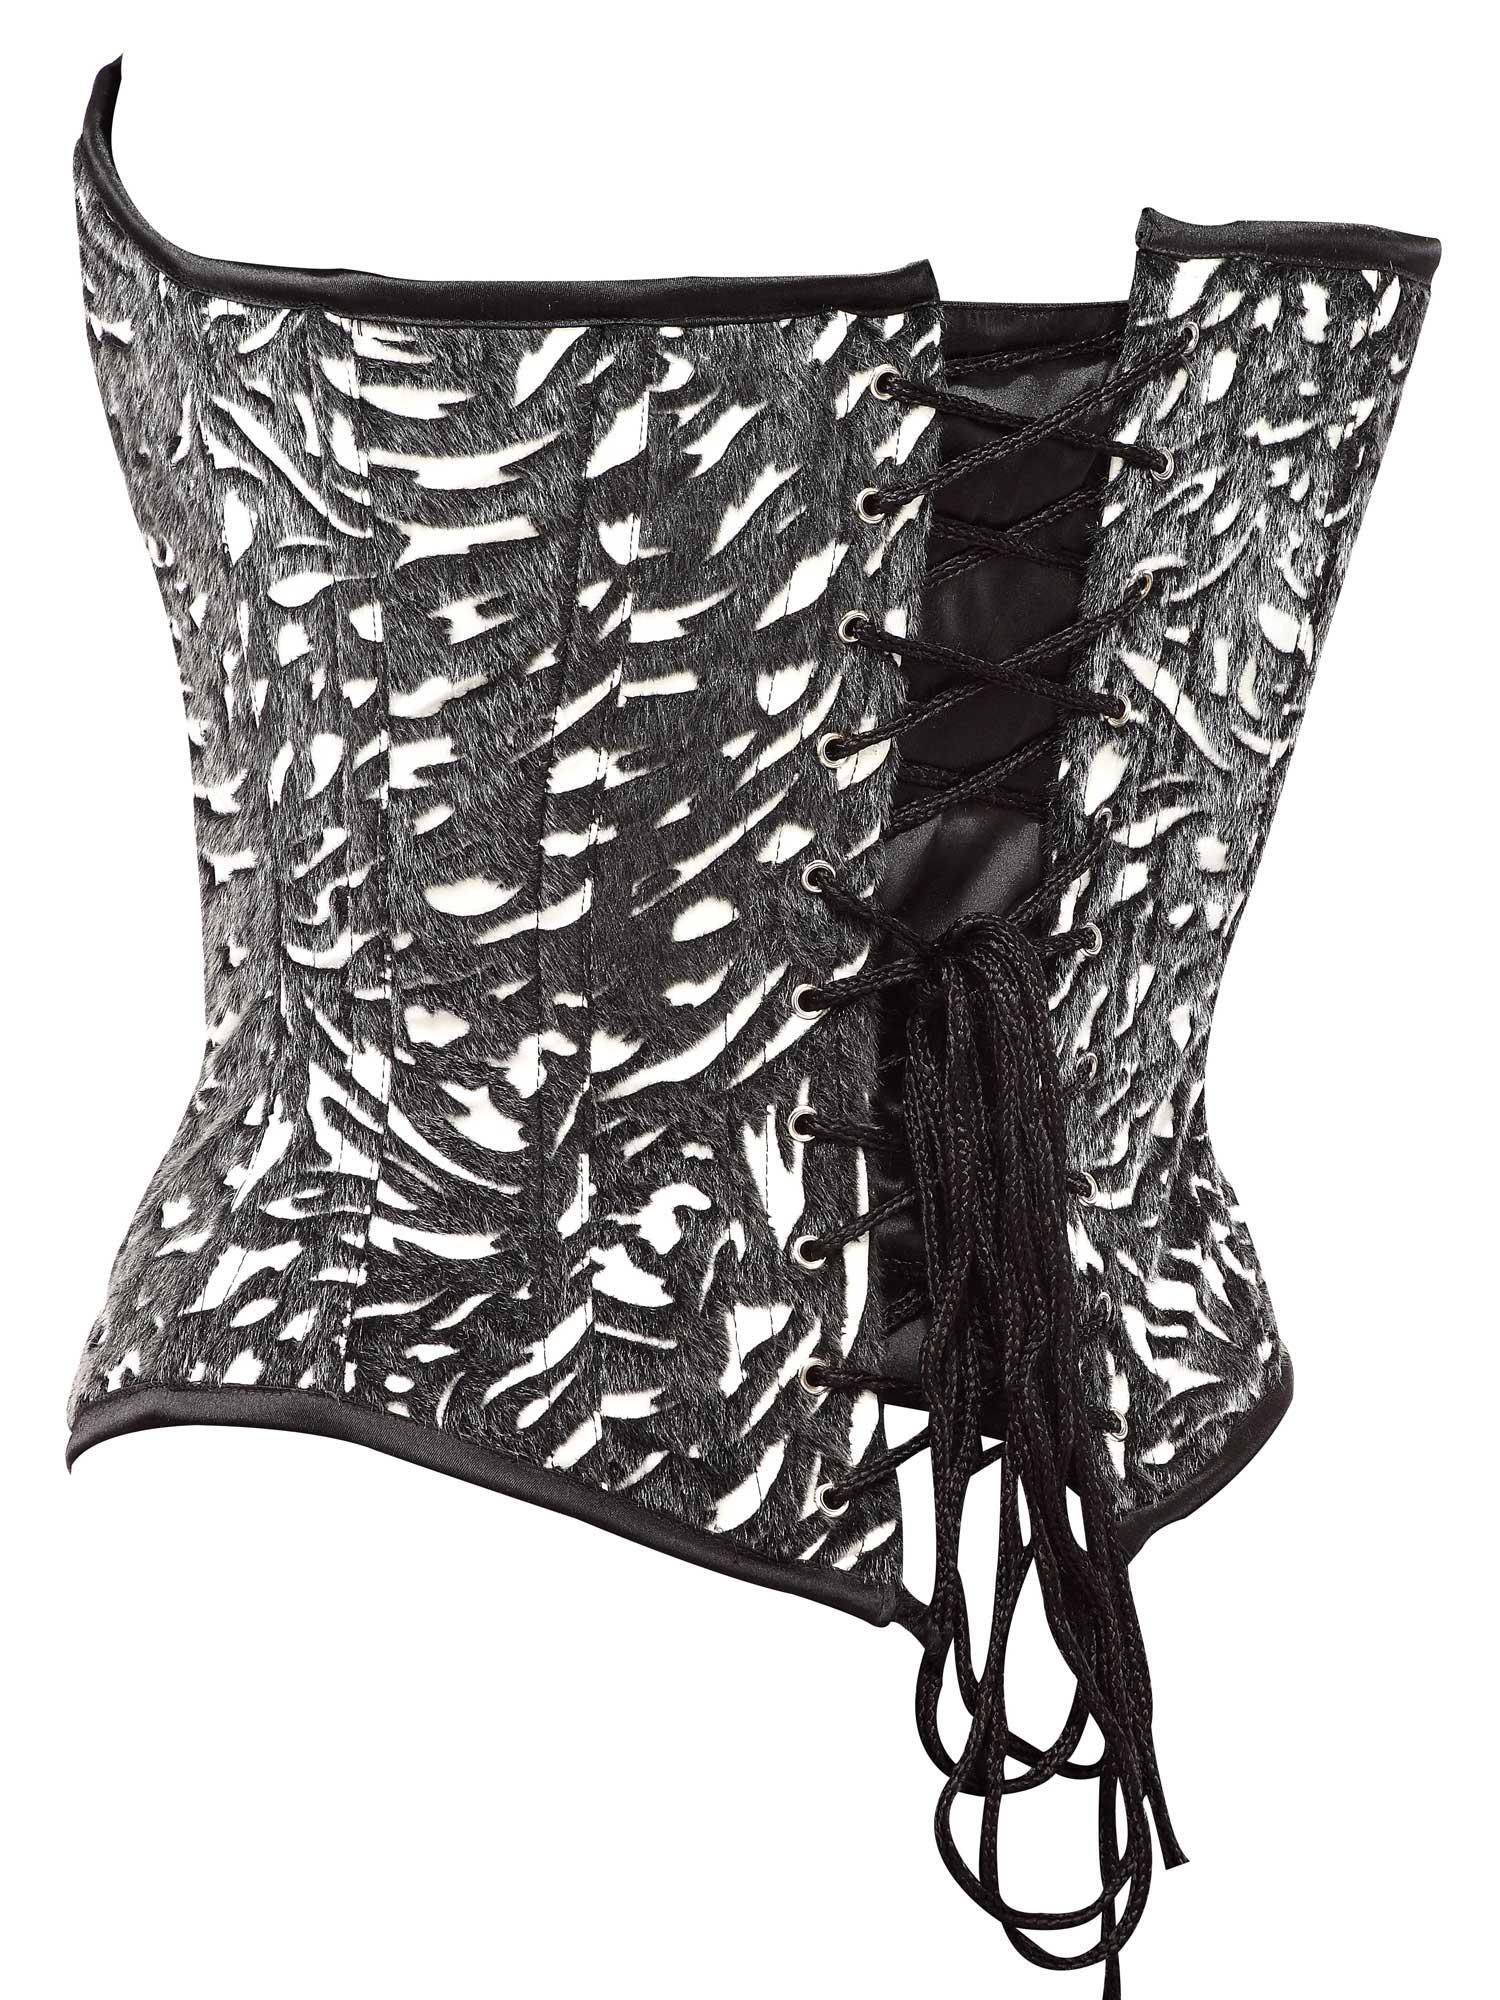 black_fur_embossed_fabric_cutwork_steel_boning_corset_waist_cincher_bustier_bustiers_and_corsets_3.jpg